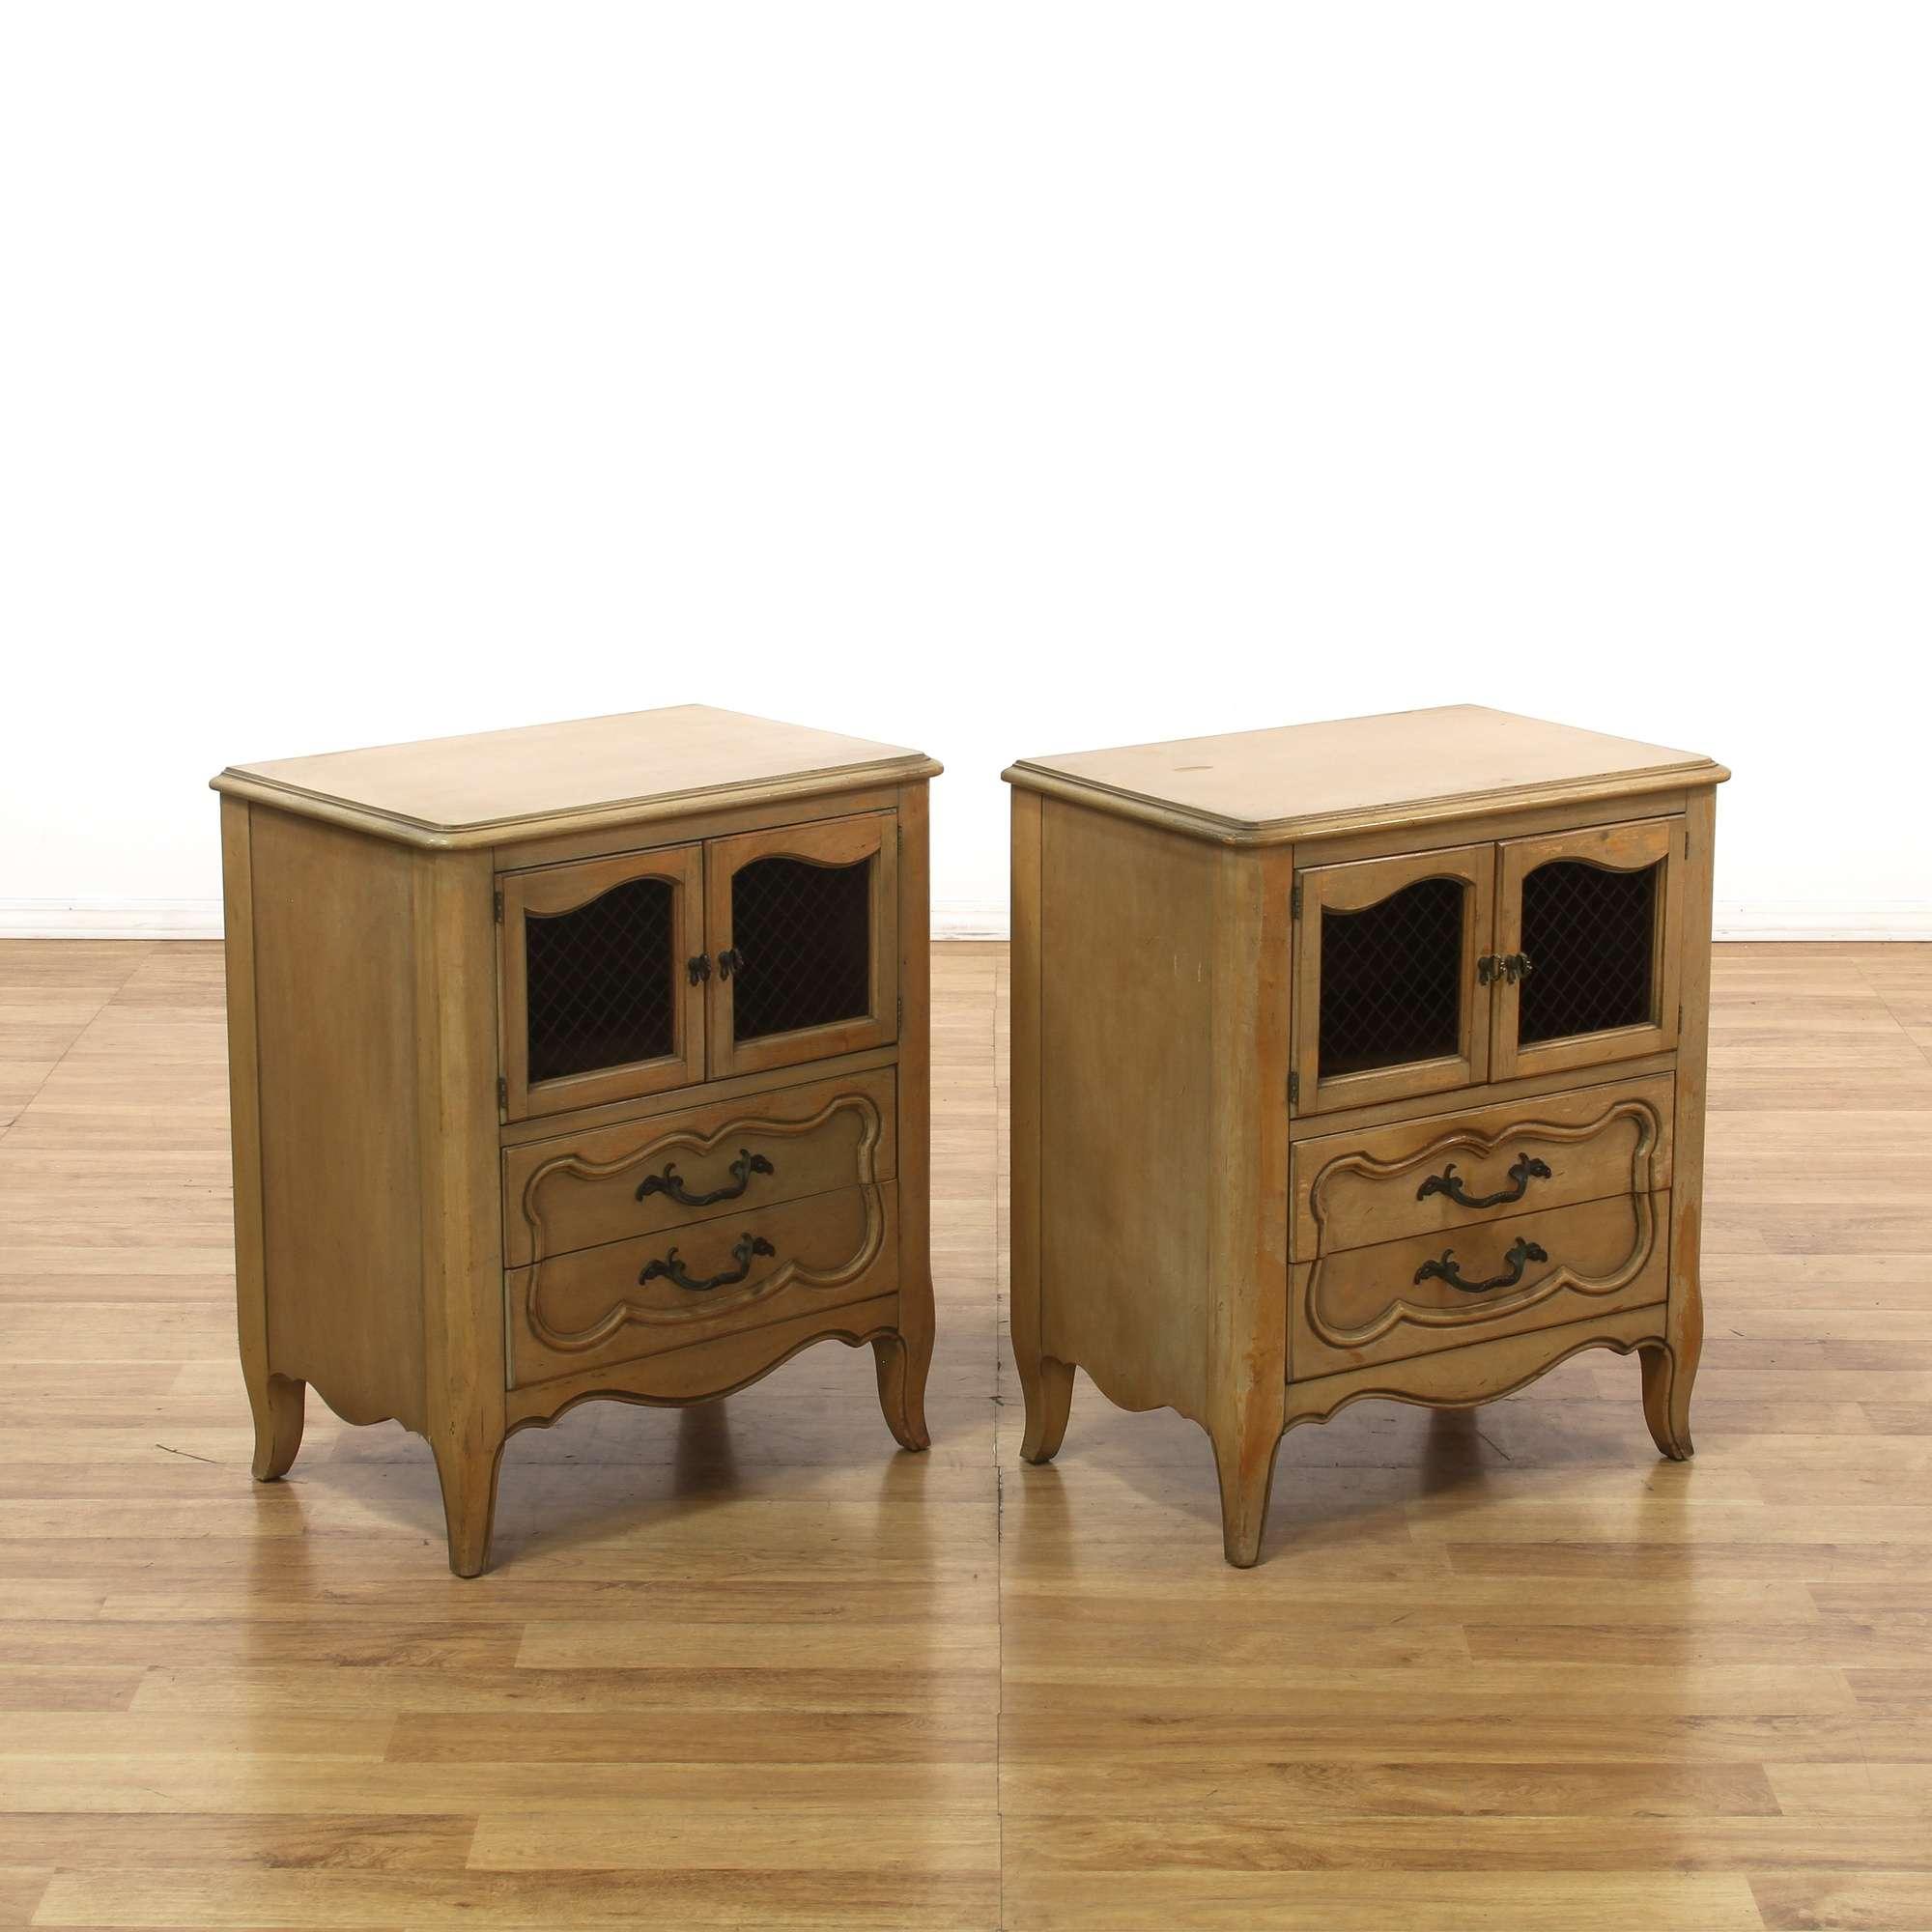 Pair Of Metz Made Bleached Wood Nightstands Loveseat Online Auctions Los Angeles